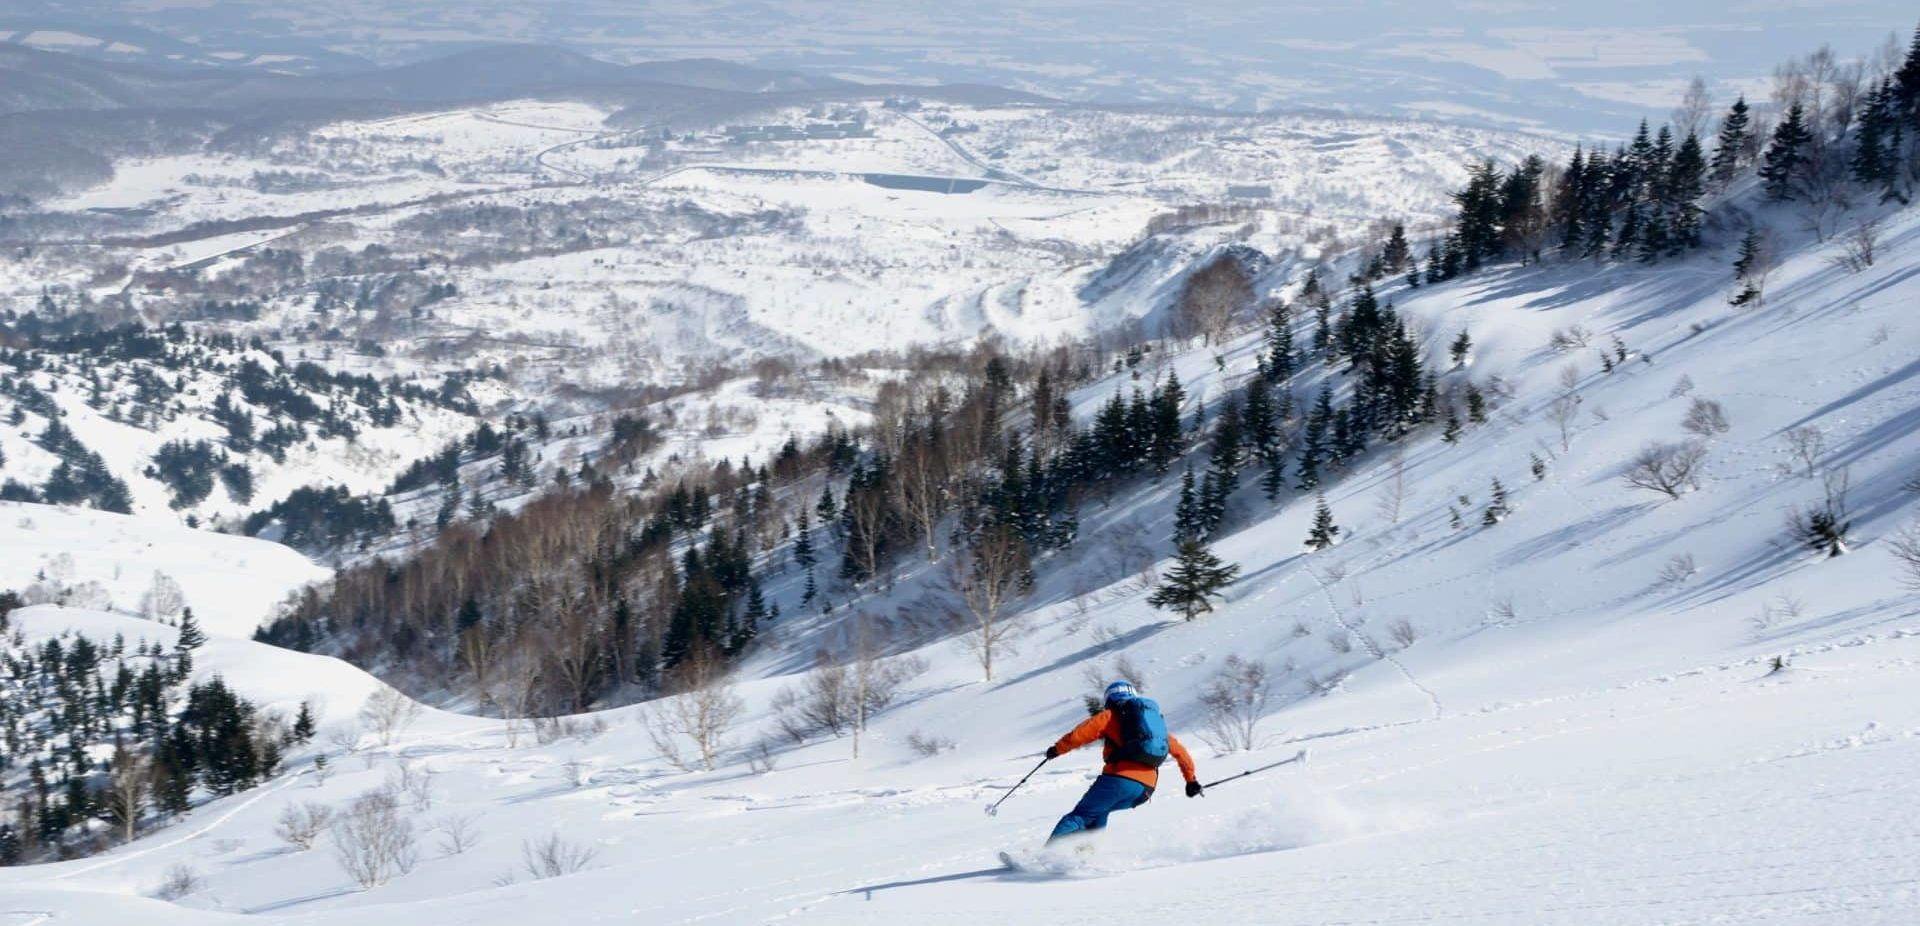 3-day backcountry skiing in Tohoku, northern Honshu